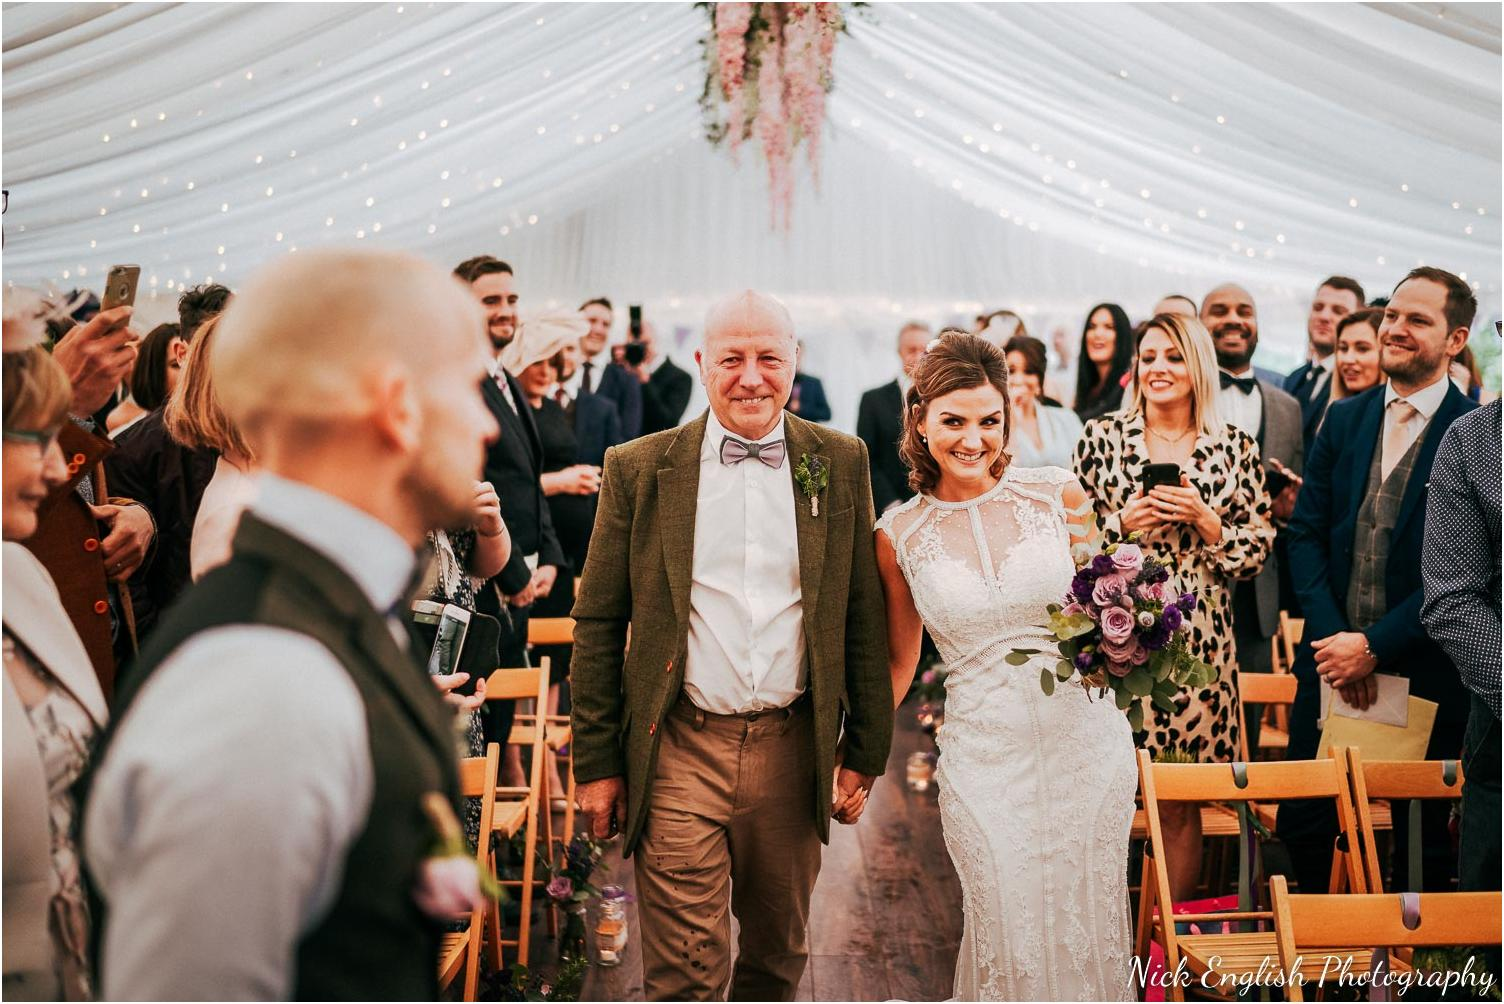 Spring_Cottage_Rivington_Lancashire_Wedding_Photographs-52.jpg